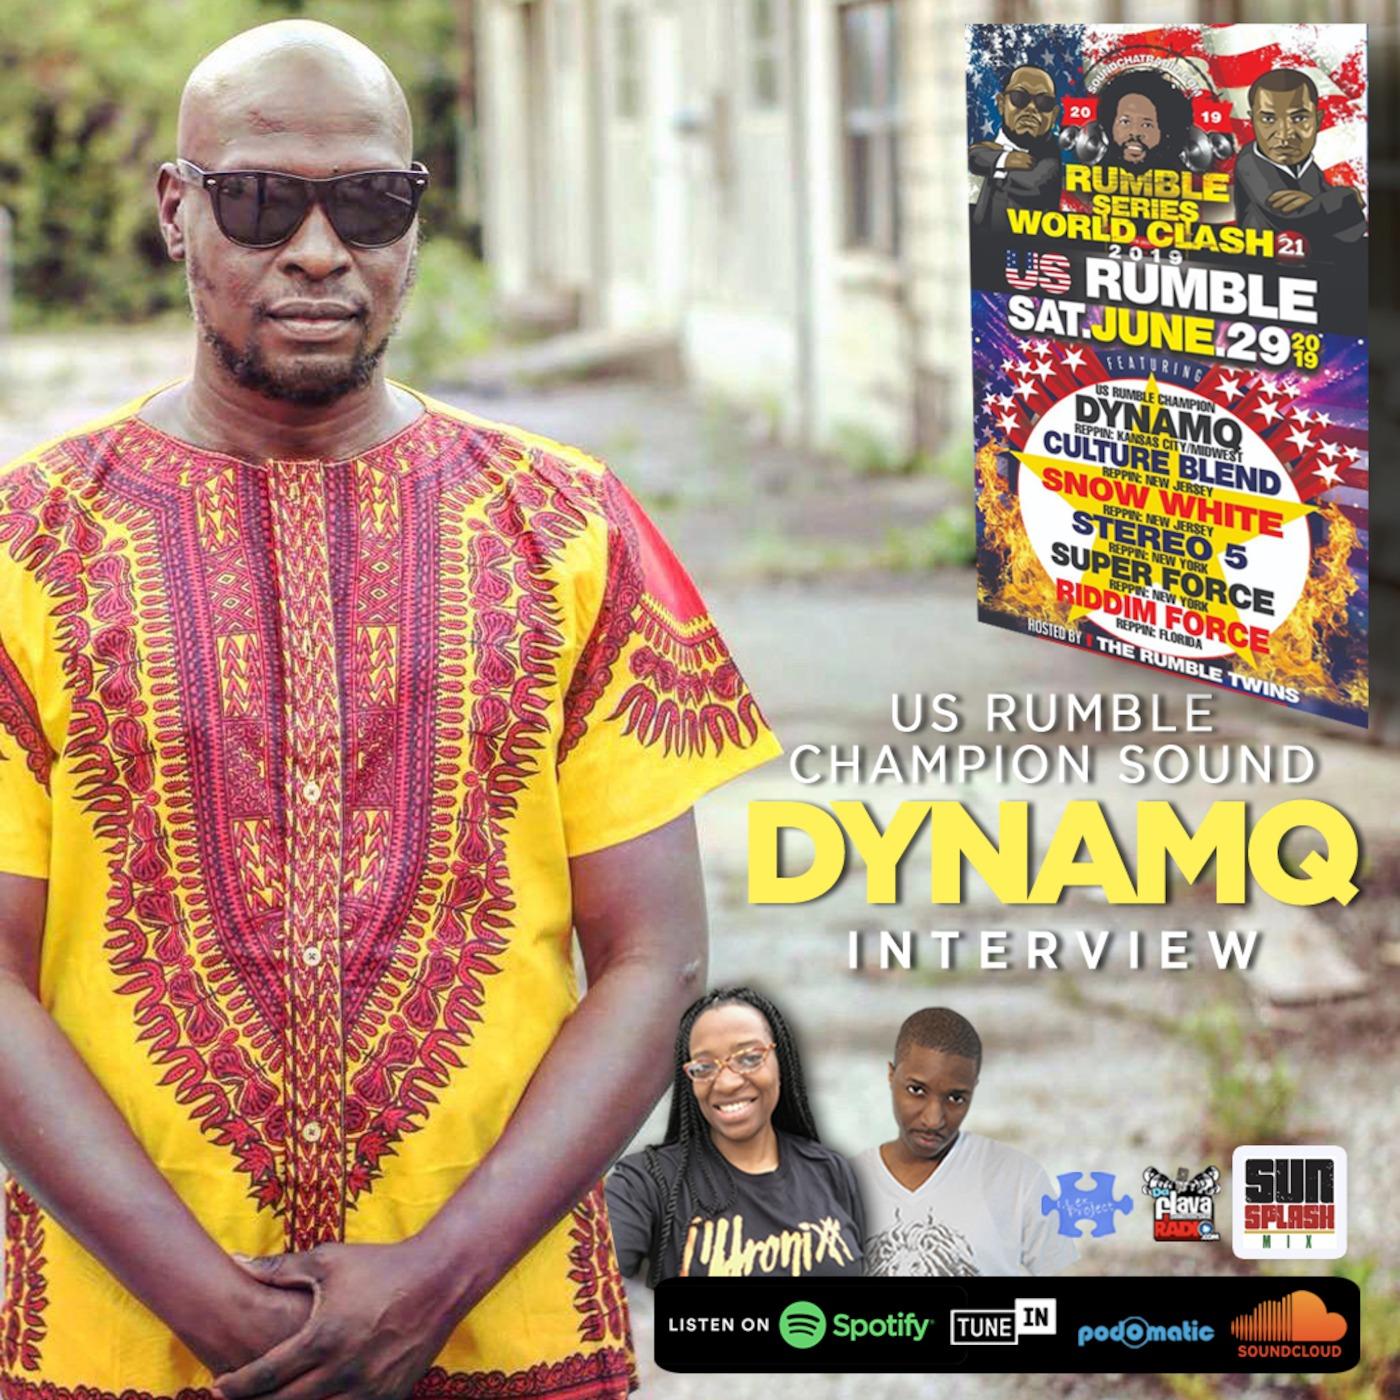 US Rumble Champion Dynamq Update Sunsplash Mix With Jah Prince